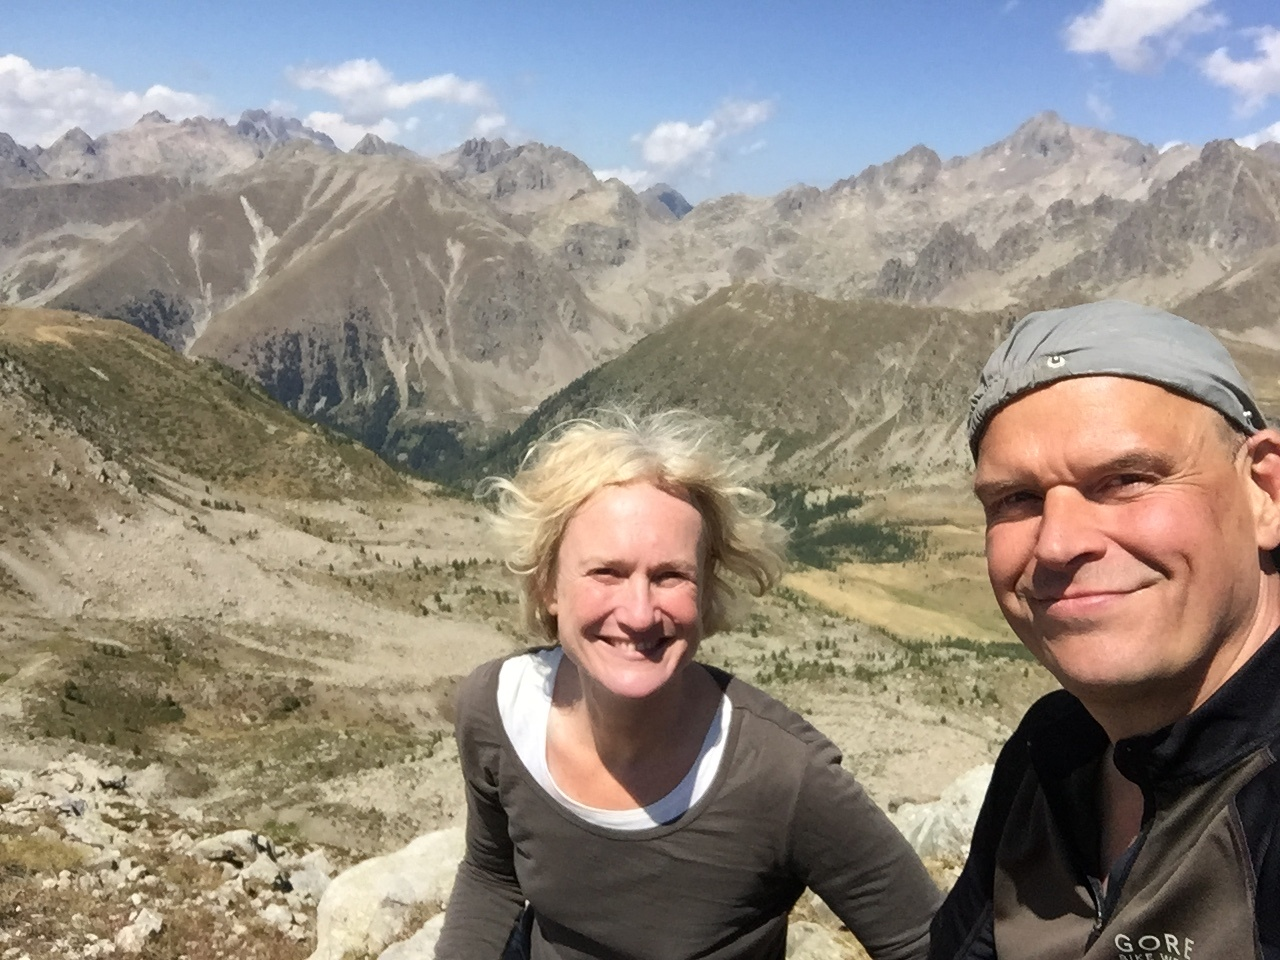 Ursula Hiking with Pete.jpg